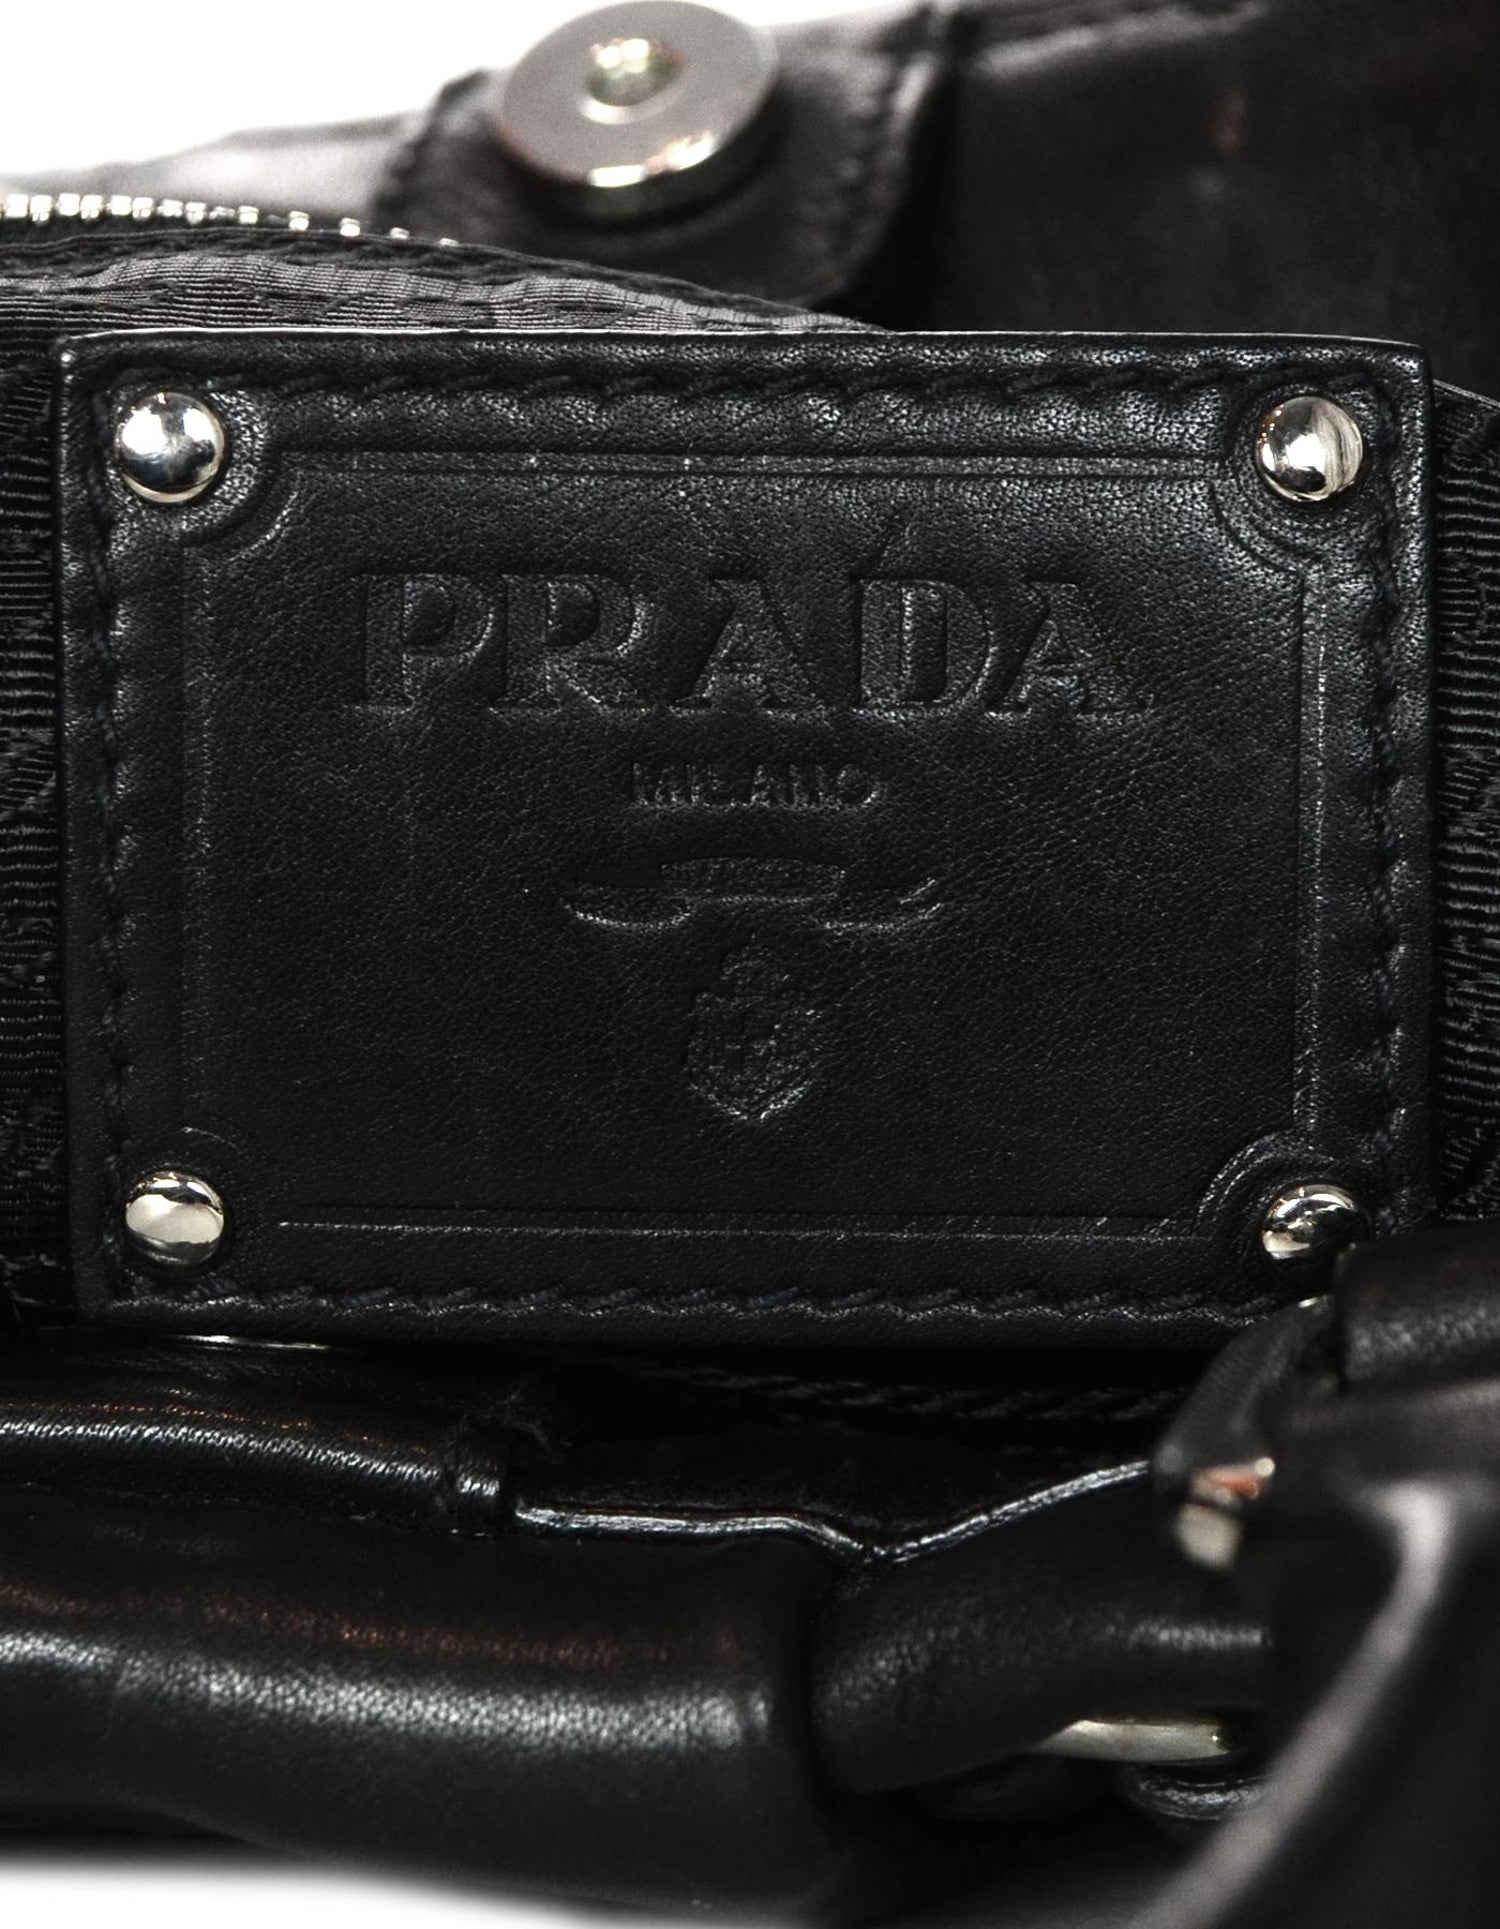 1c8feab51082 Prada Black Soft Calf Leather Top Handle Bag W  Crossbody Strap For Sale at  1stdibs